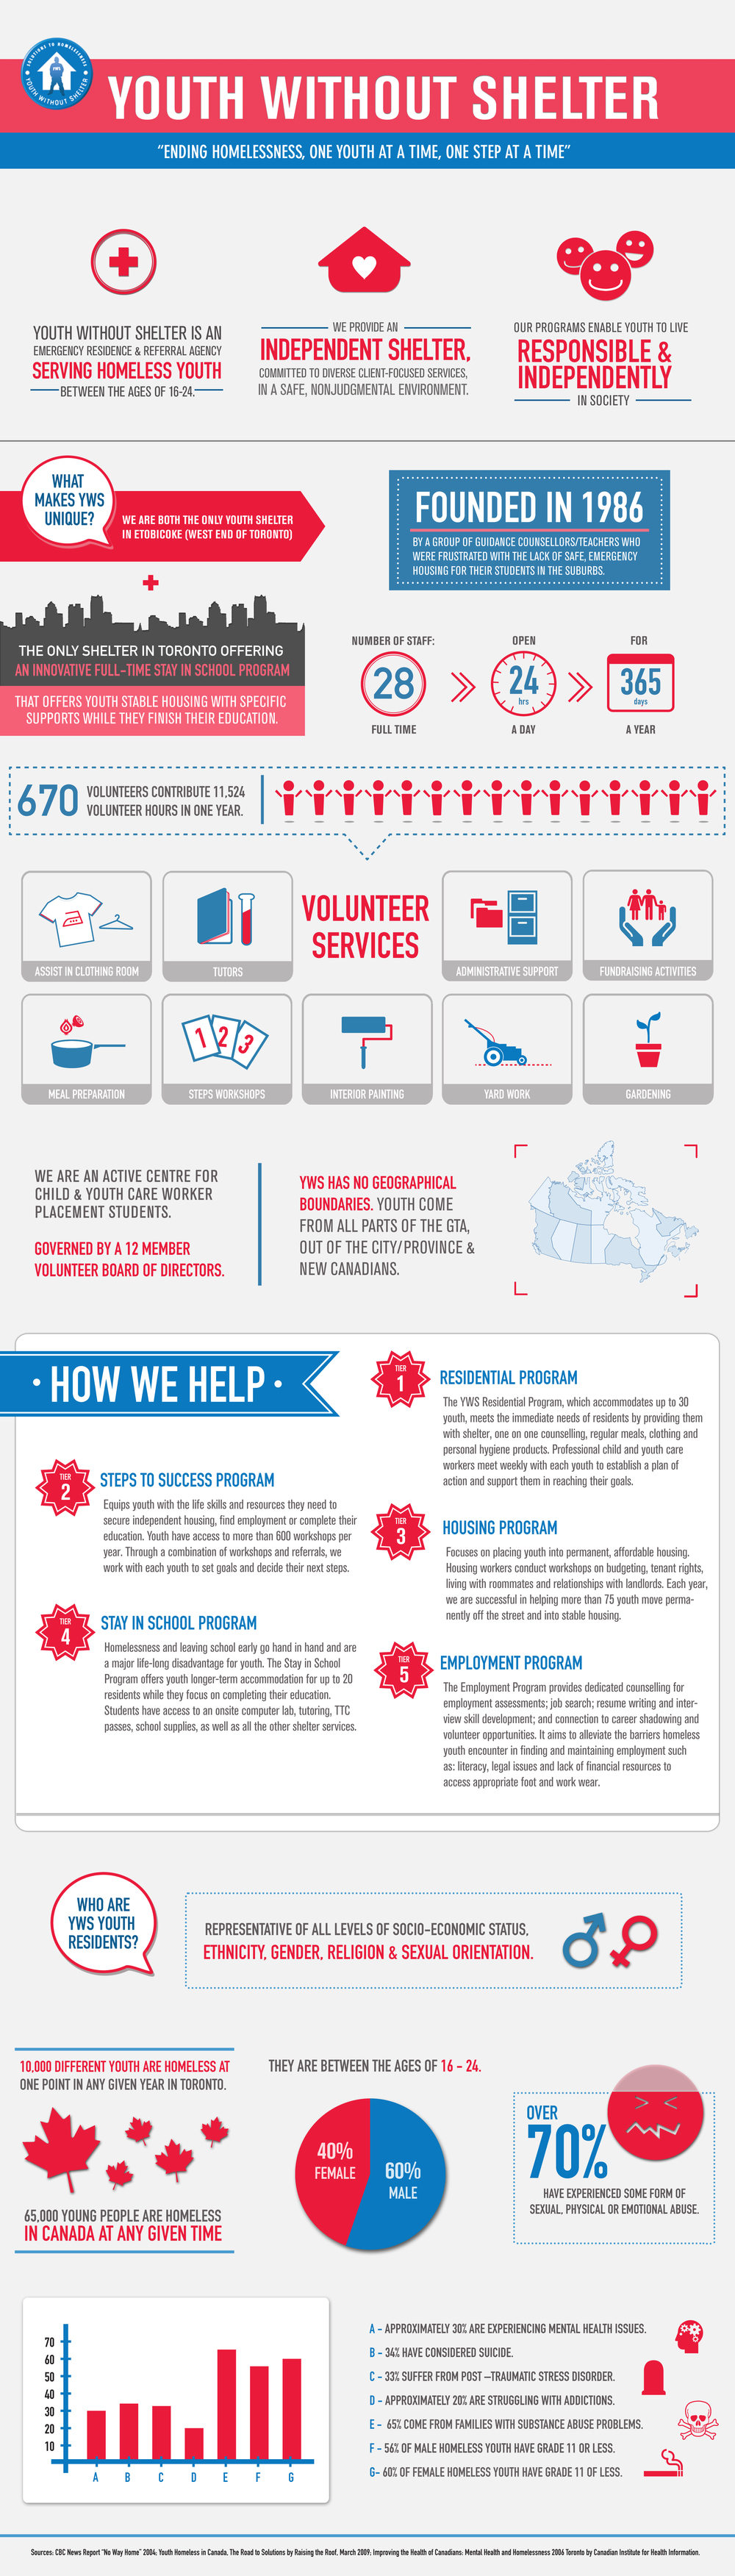 yws-infographic-jessicalock-2012.jpg